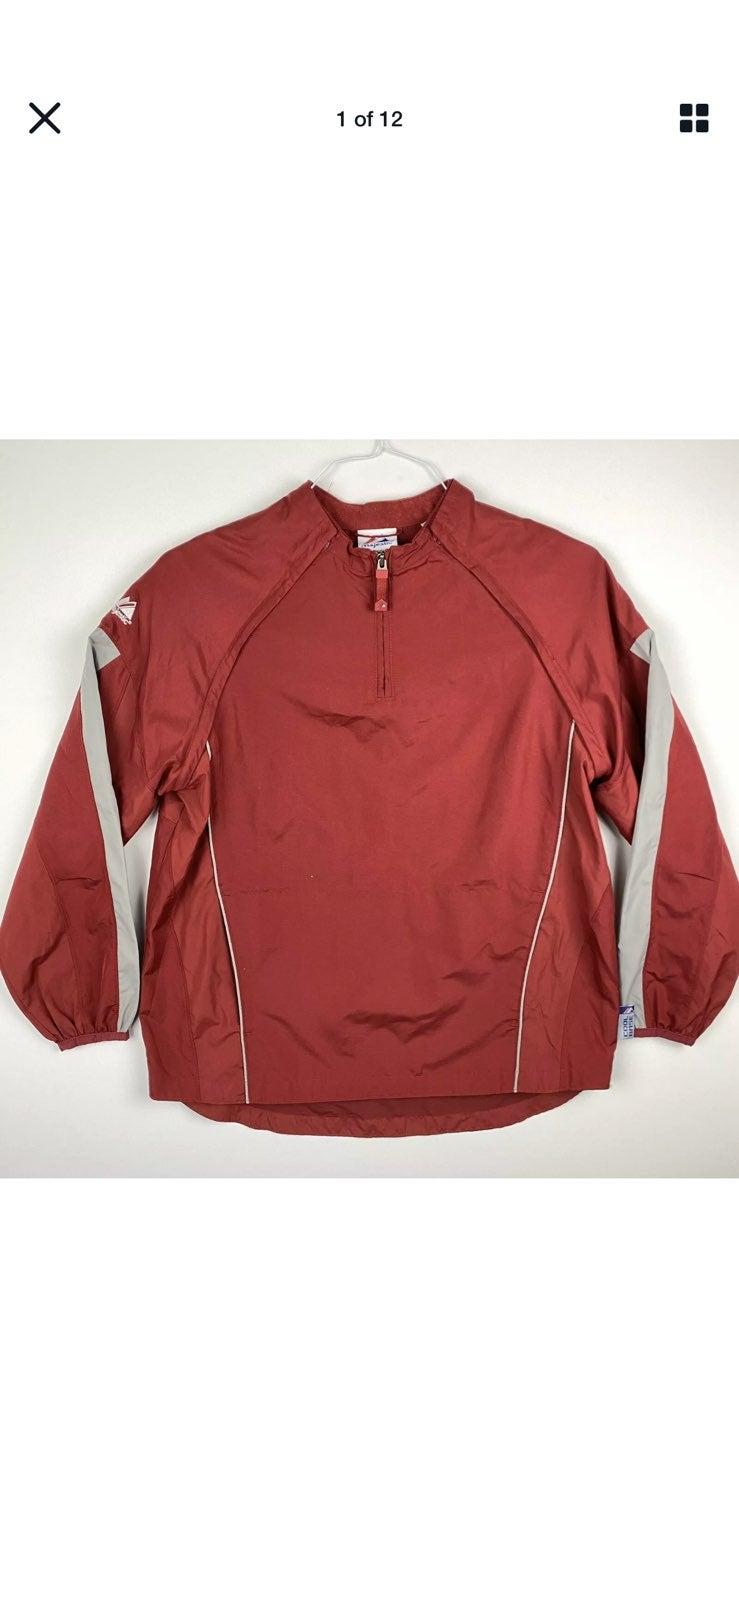 Majestic Cool Base YXL Warm Up Jacket